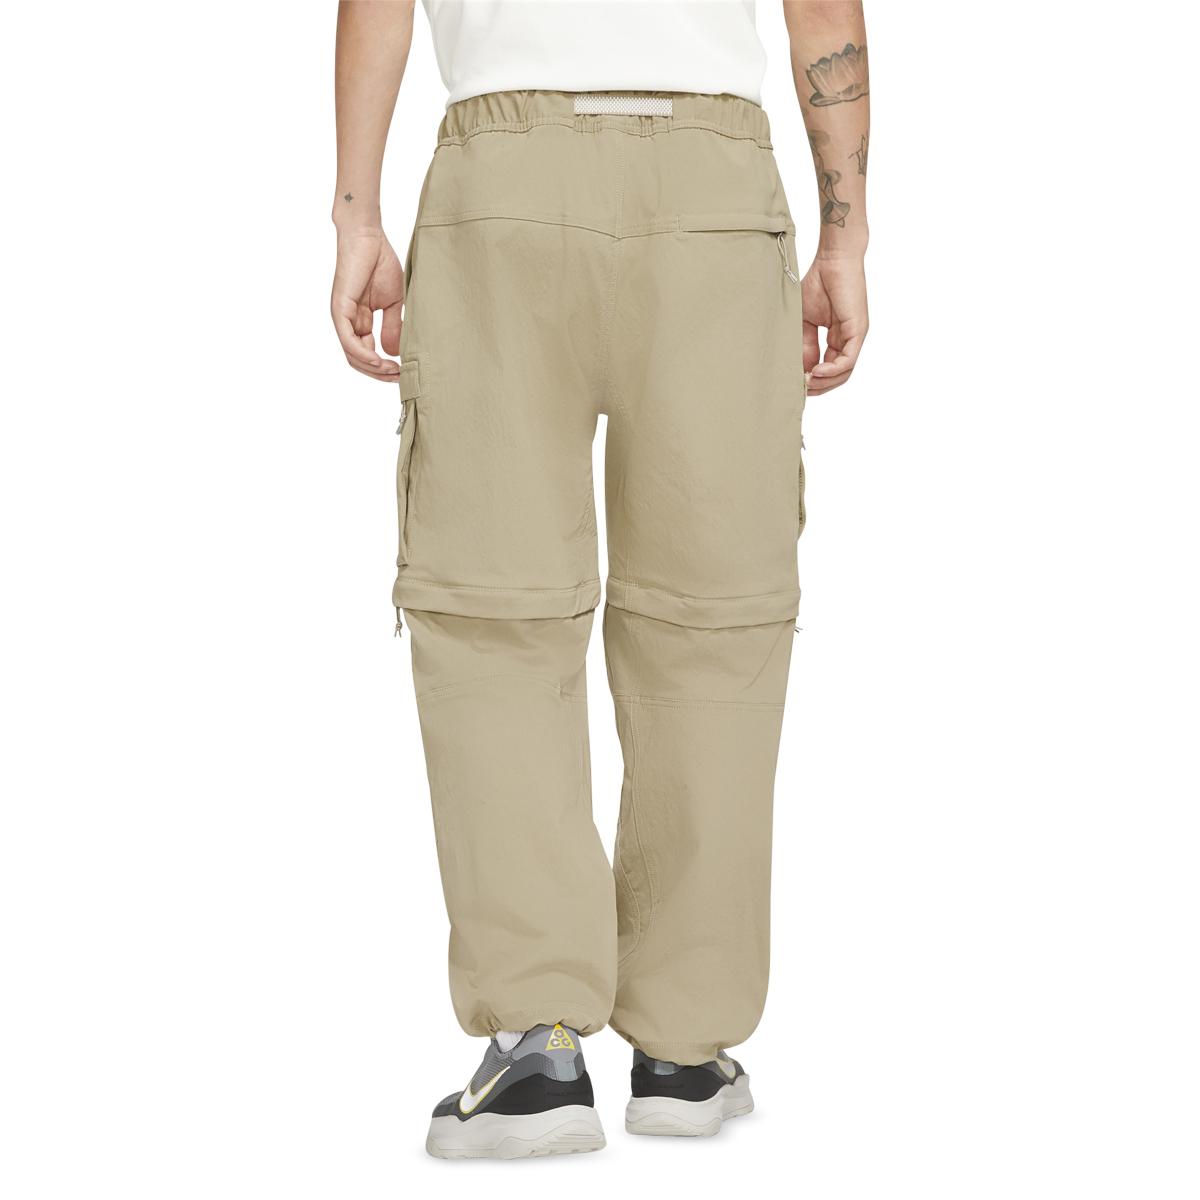 Nike NRG ACG Convertible Cargo Pant